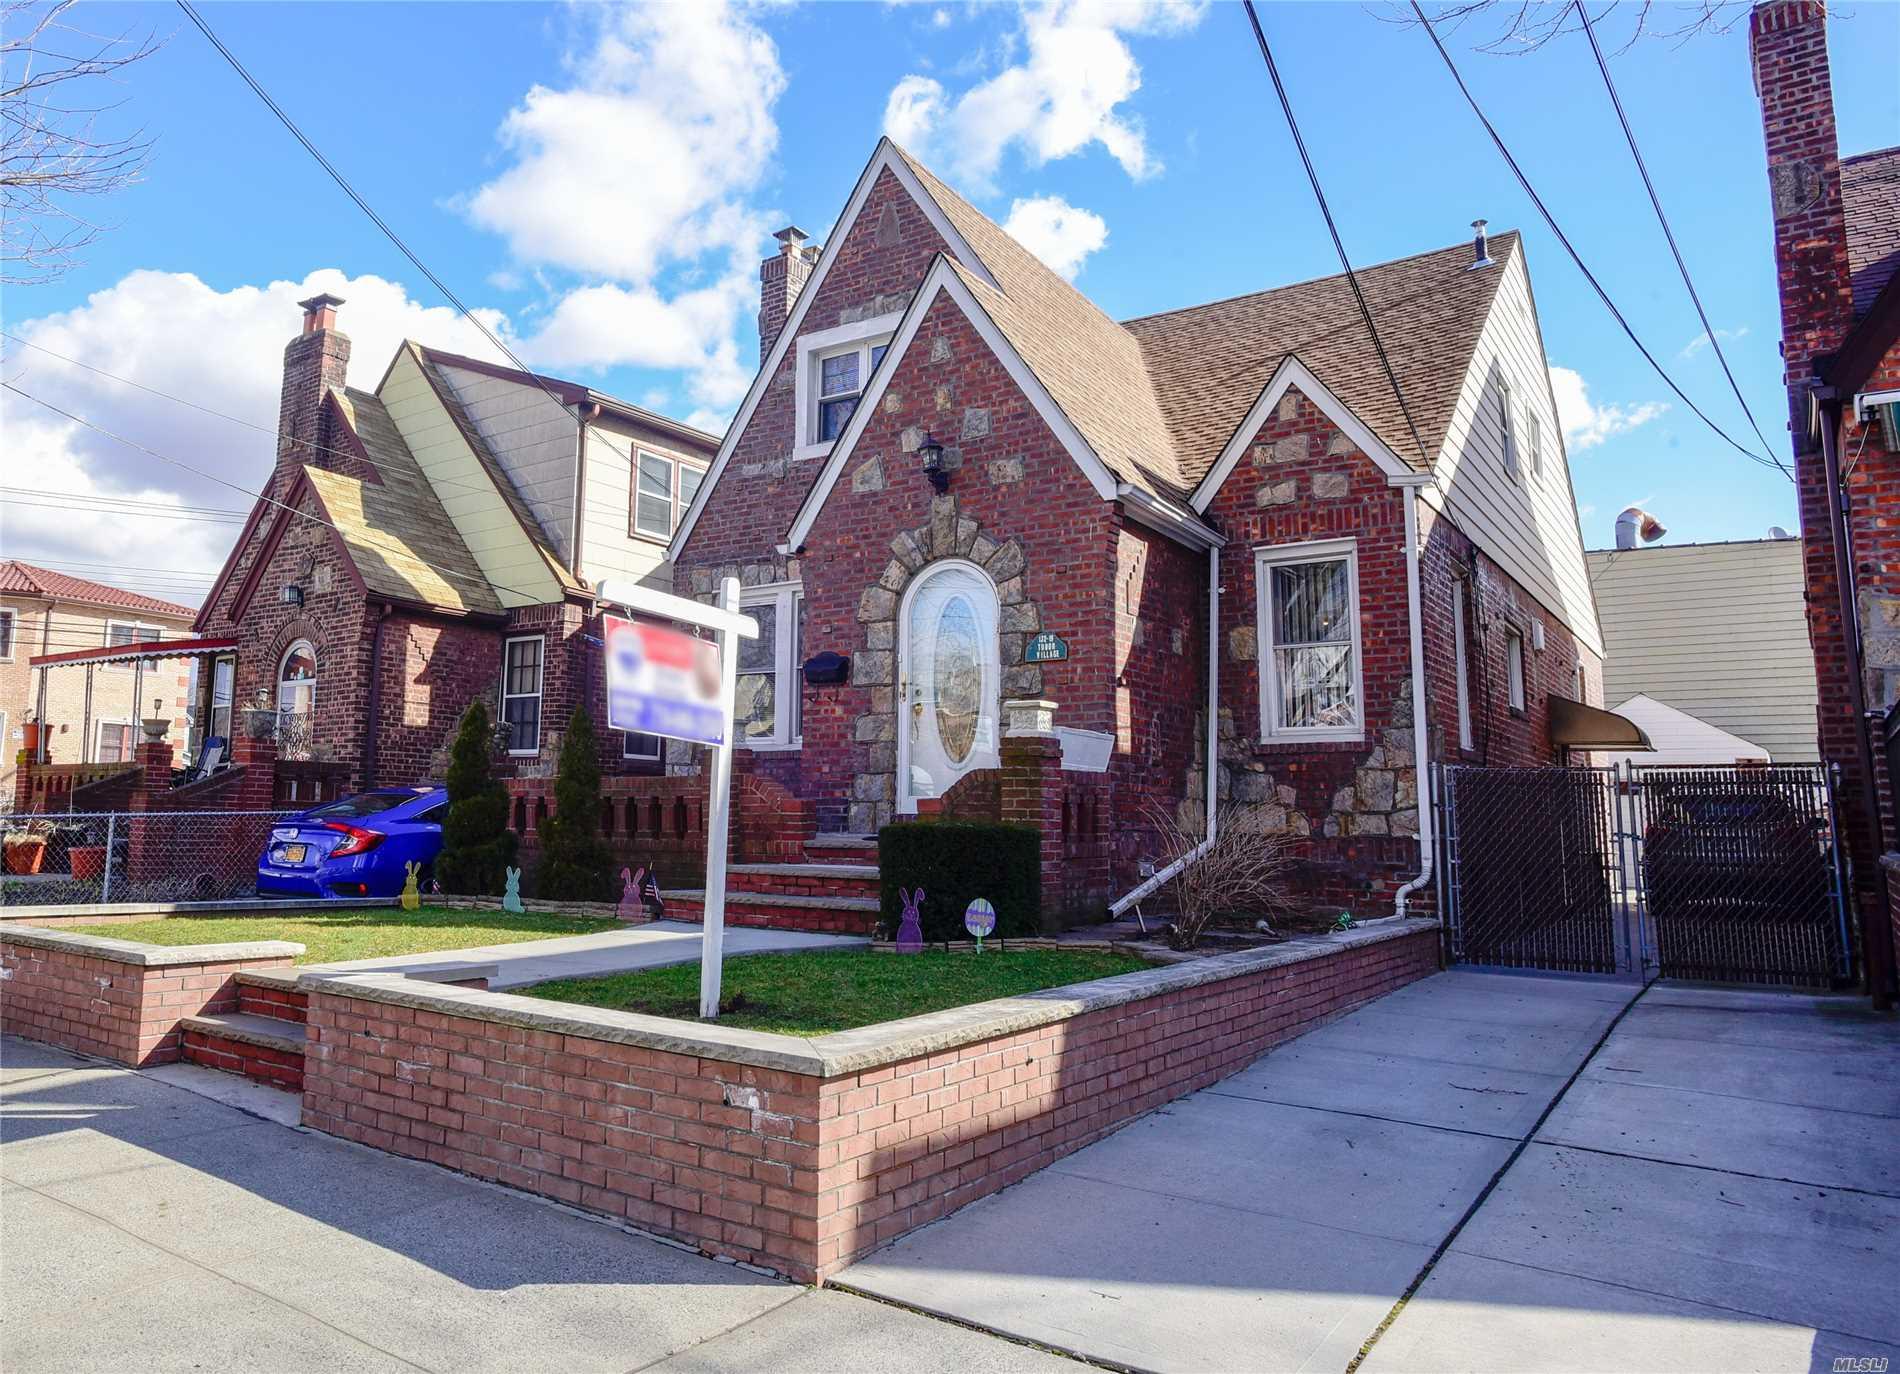 Property for sale at 132-19 84th Street, Ozone Park NY 11417, Ozone Park,  New York 11417